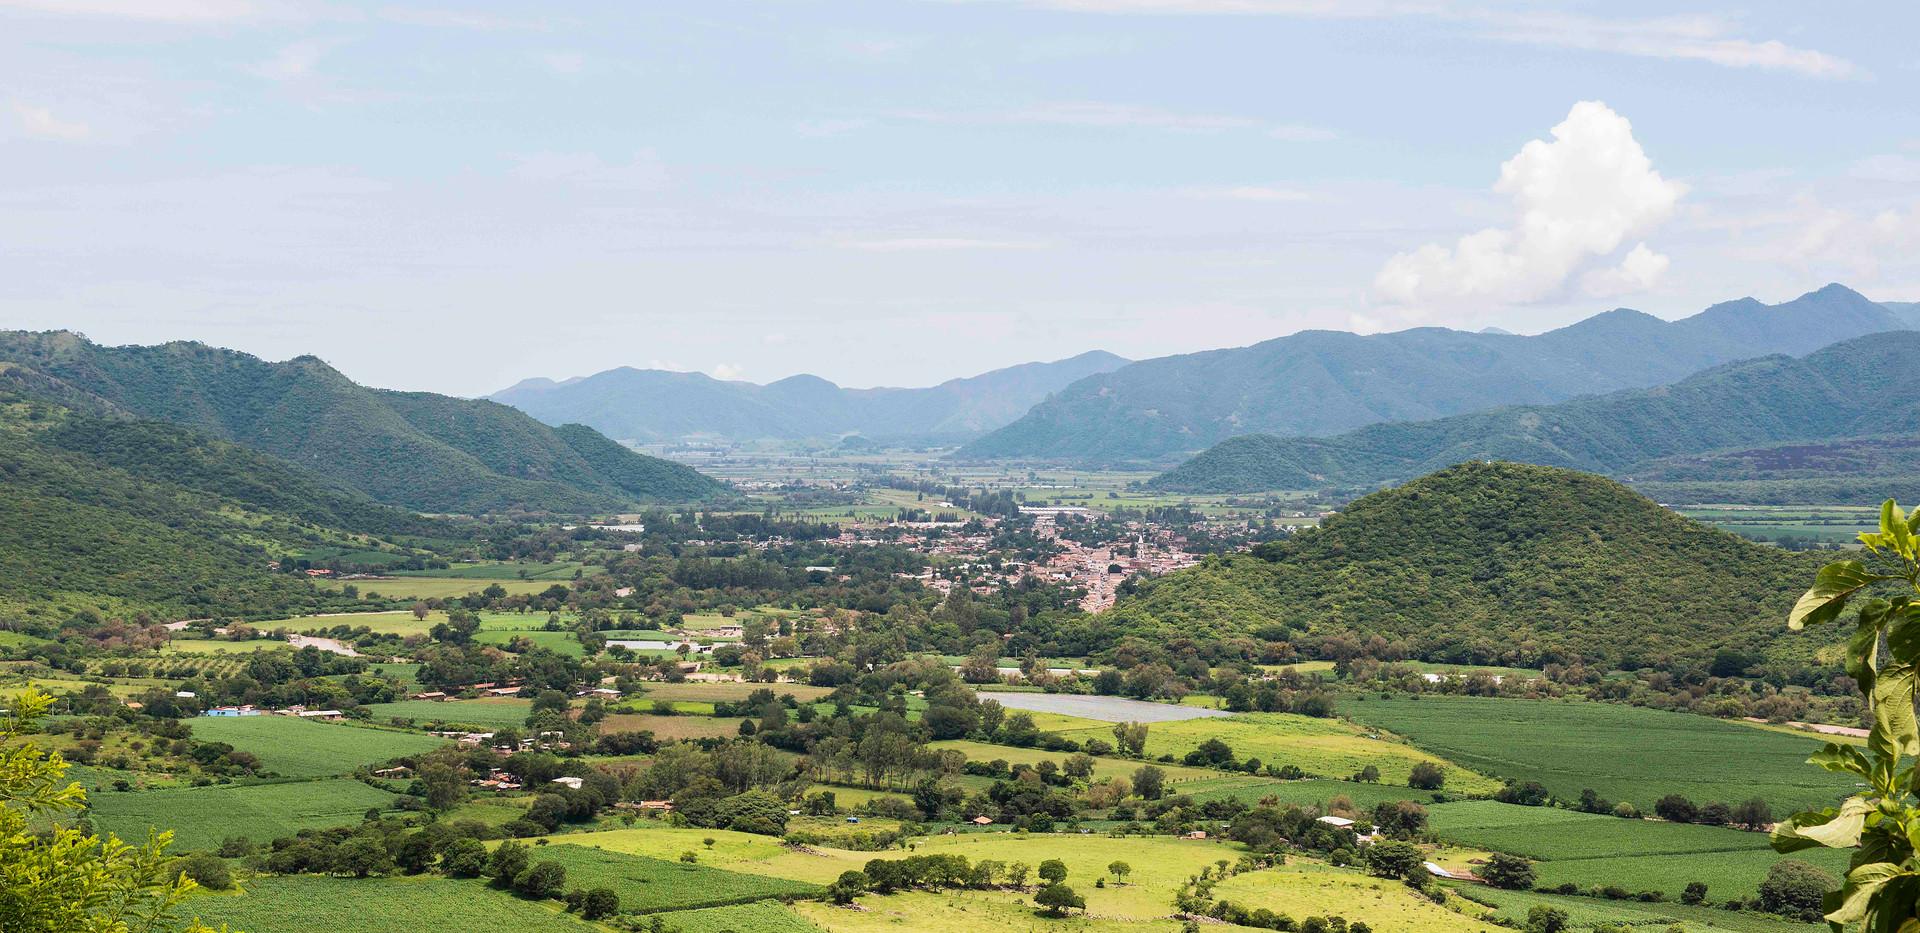 Mascota valley - Jalisco